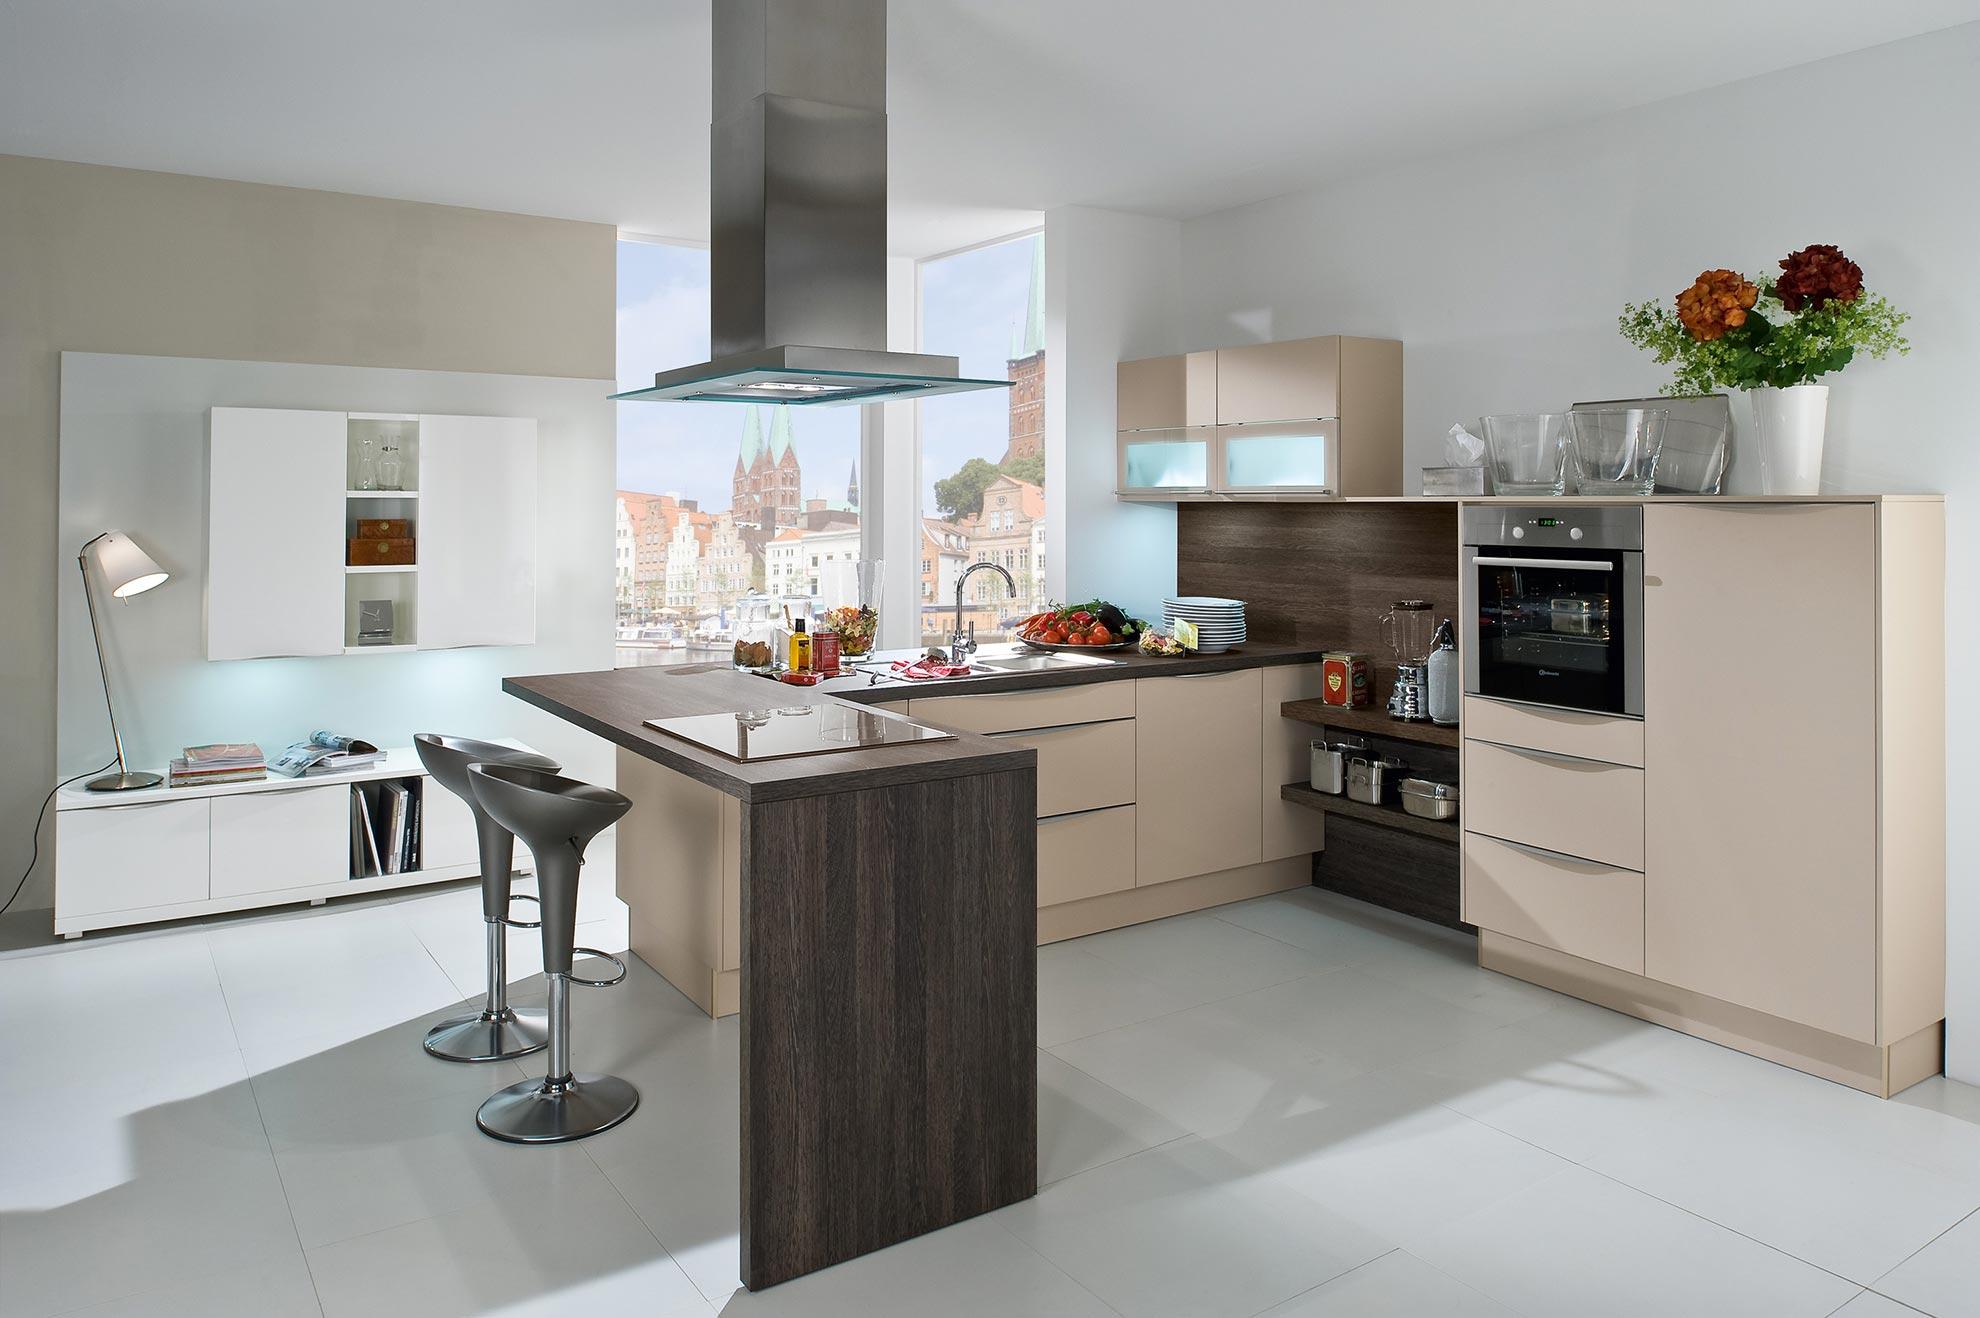 Kitchens Bedford & Bedfordshire (Fitted Kitchen Installation)